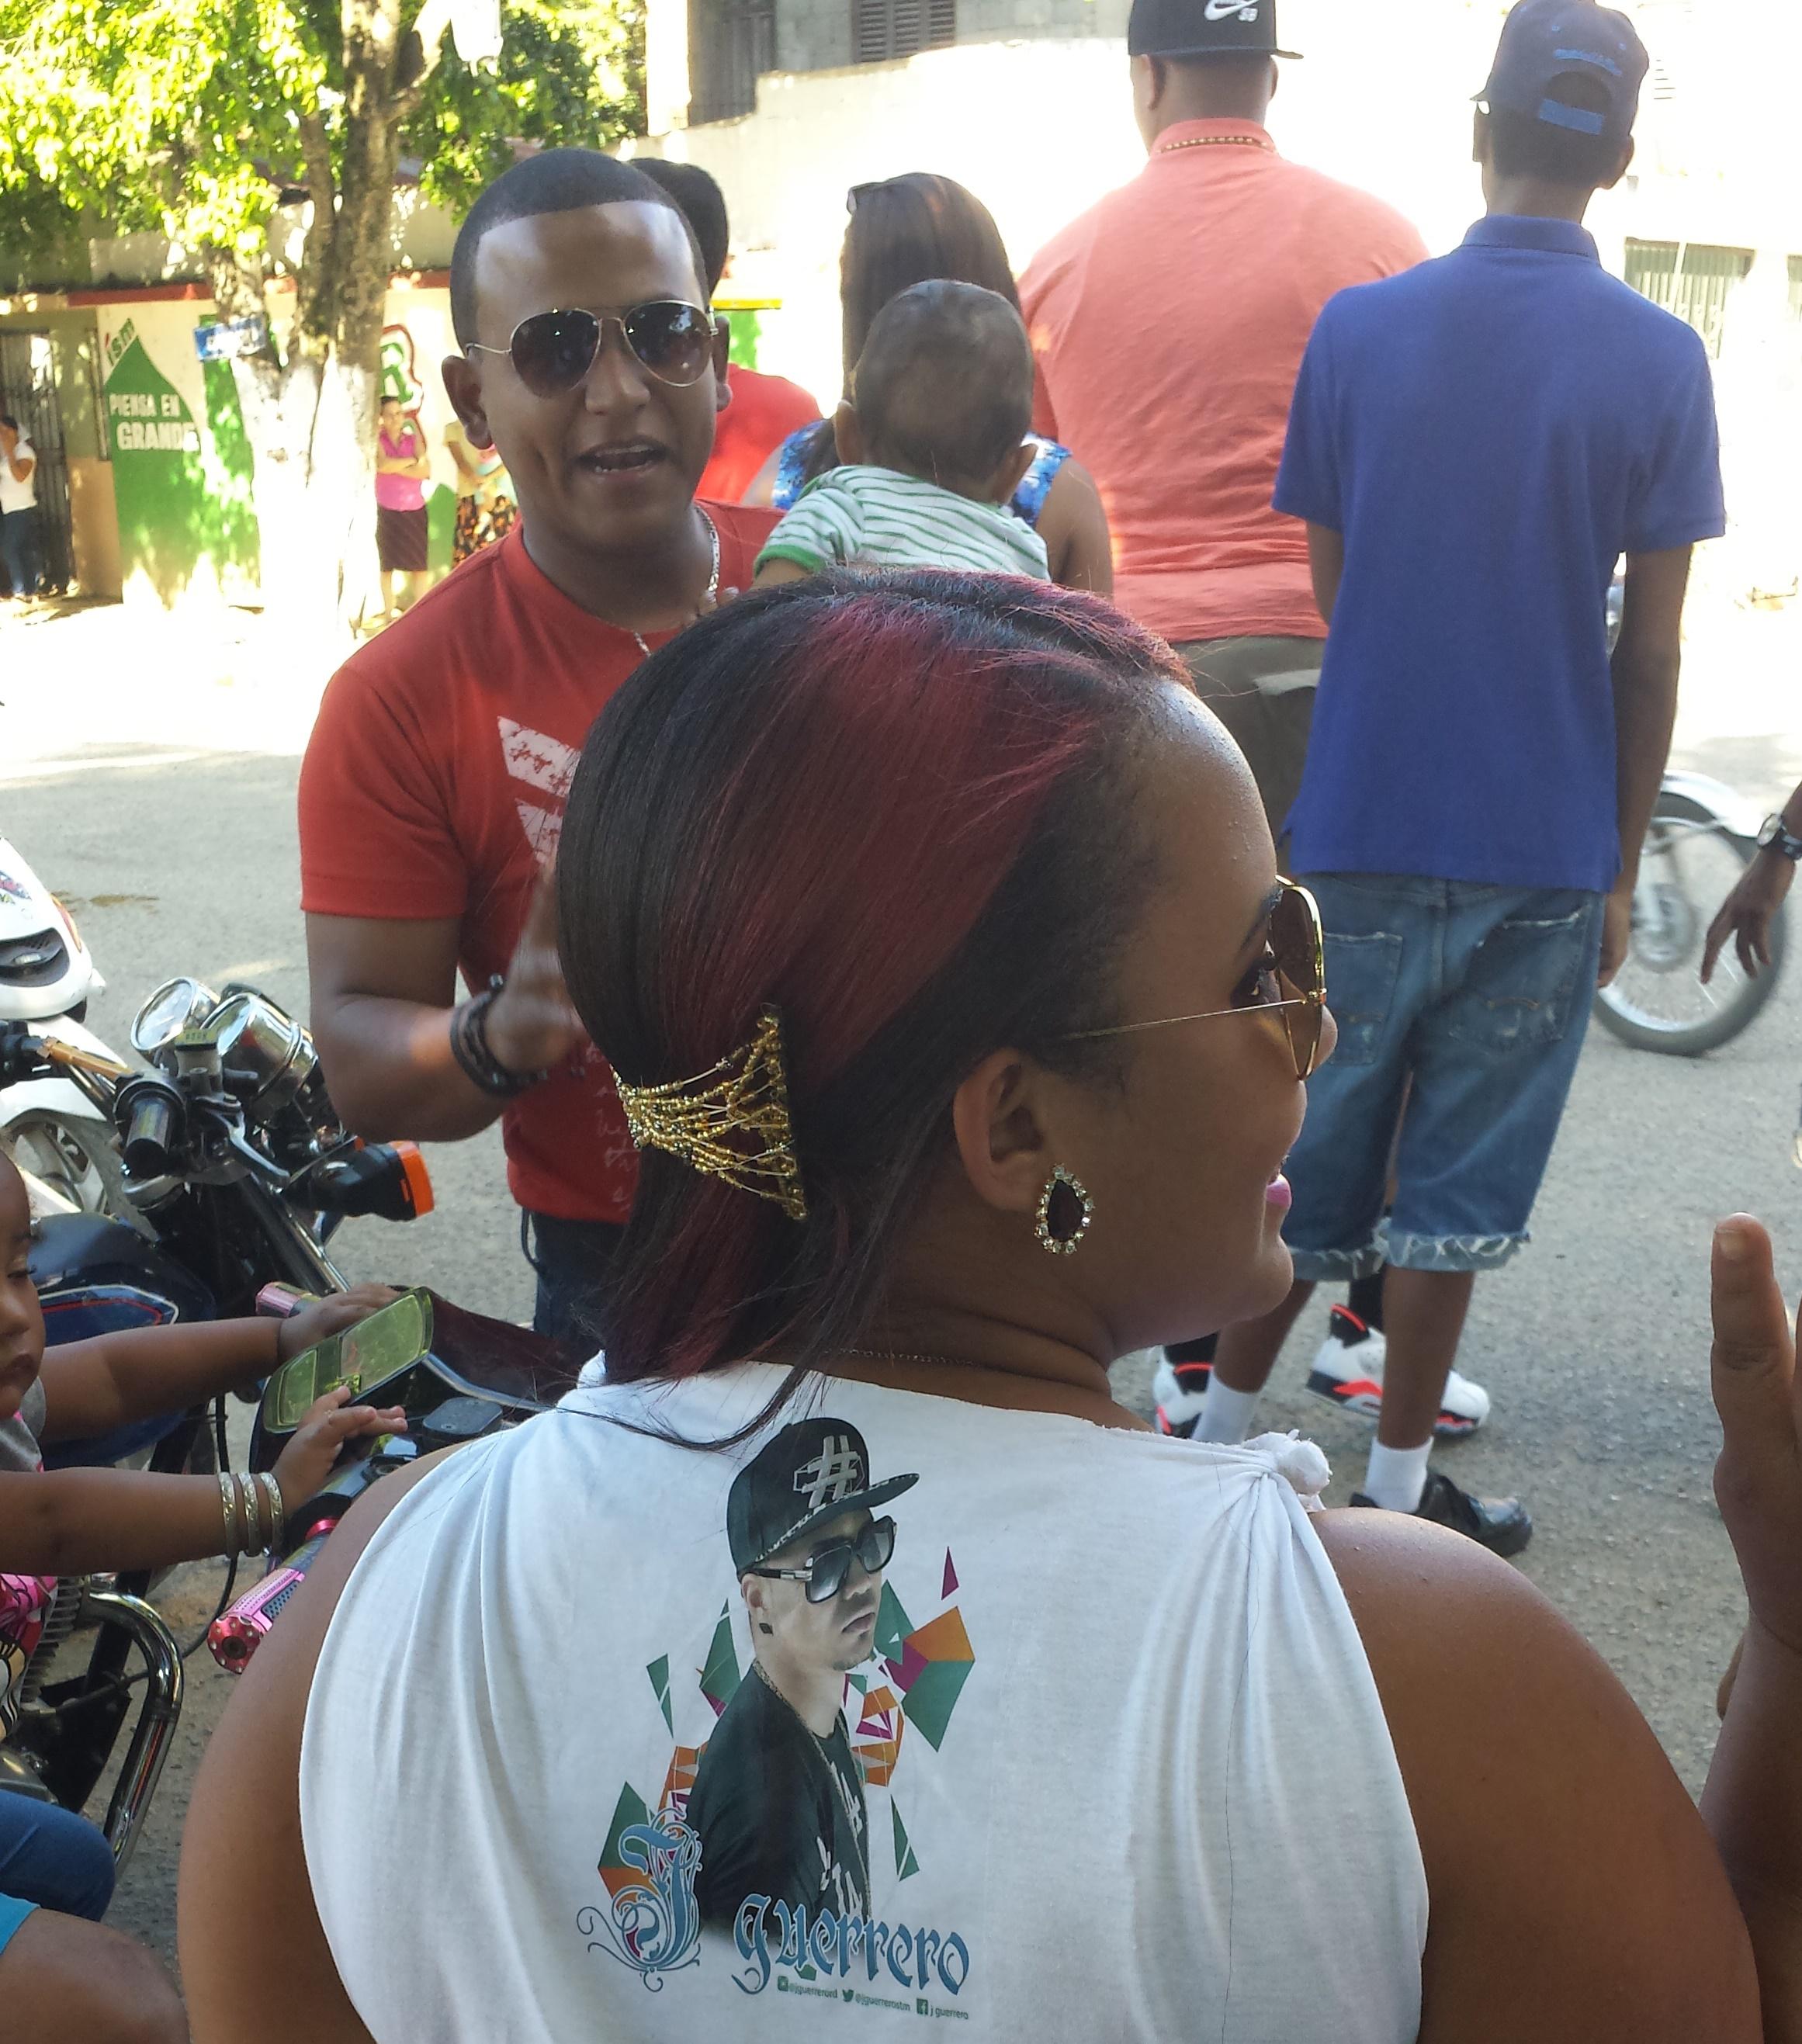 Imagenes del Desfile del Carnaval Vegano 2016